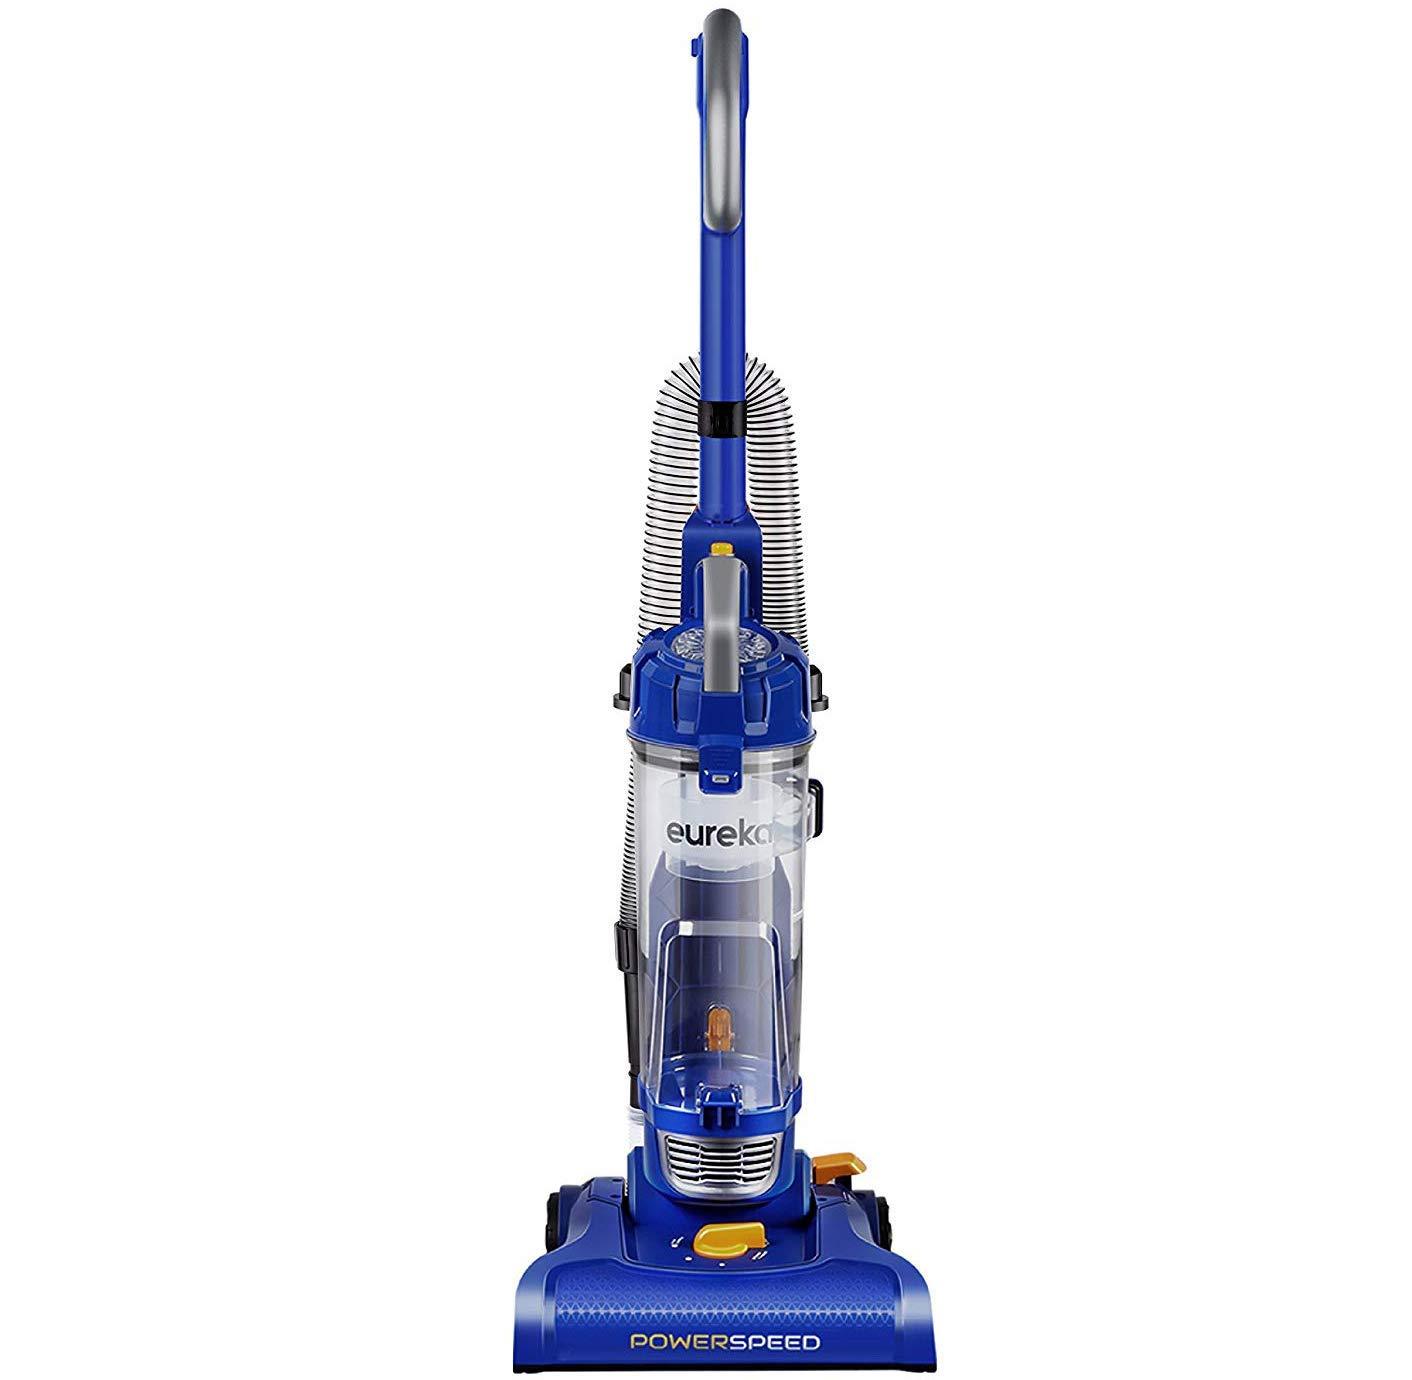 Eureka NEU182A PowerSpeed Lightweight Bagless Upright Vacuum Cleaner, Blue (Renewed) by EUREKA